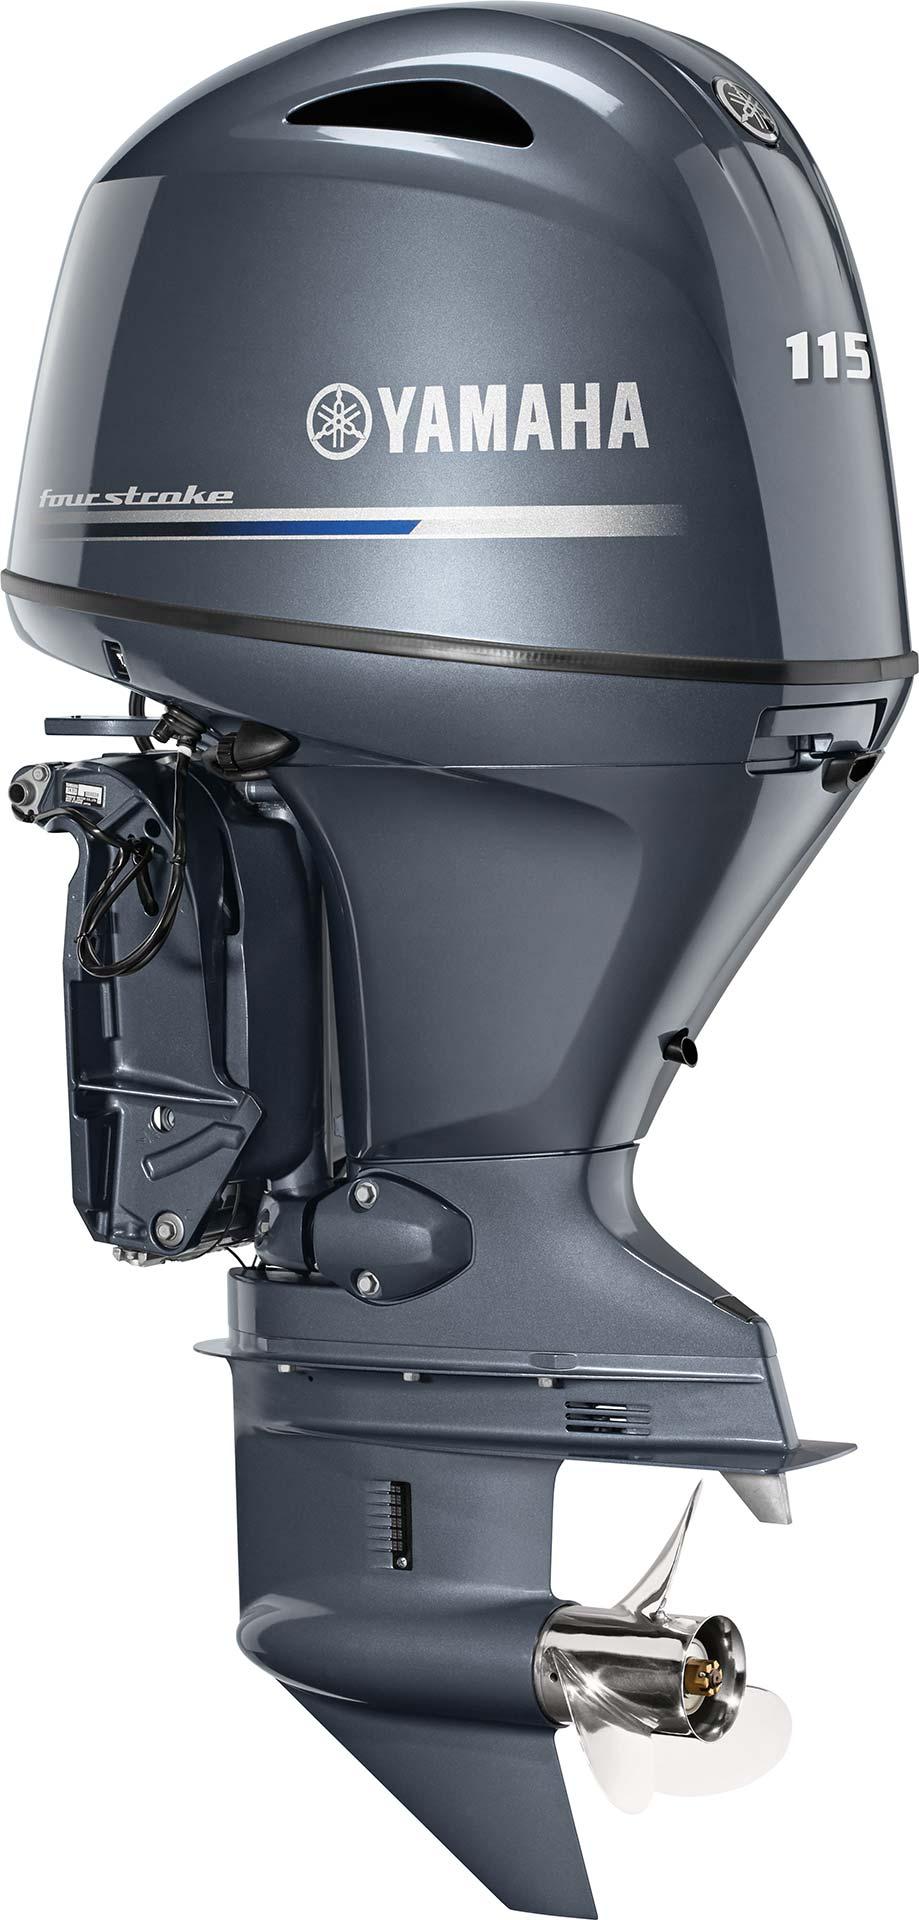 Yamaha F115LB In-Line 4 / 1.8L